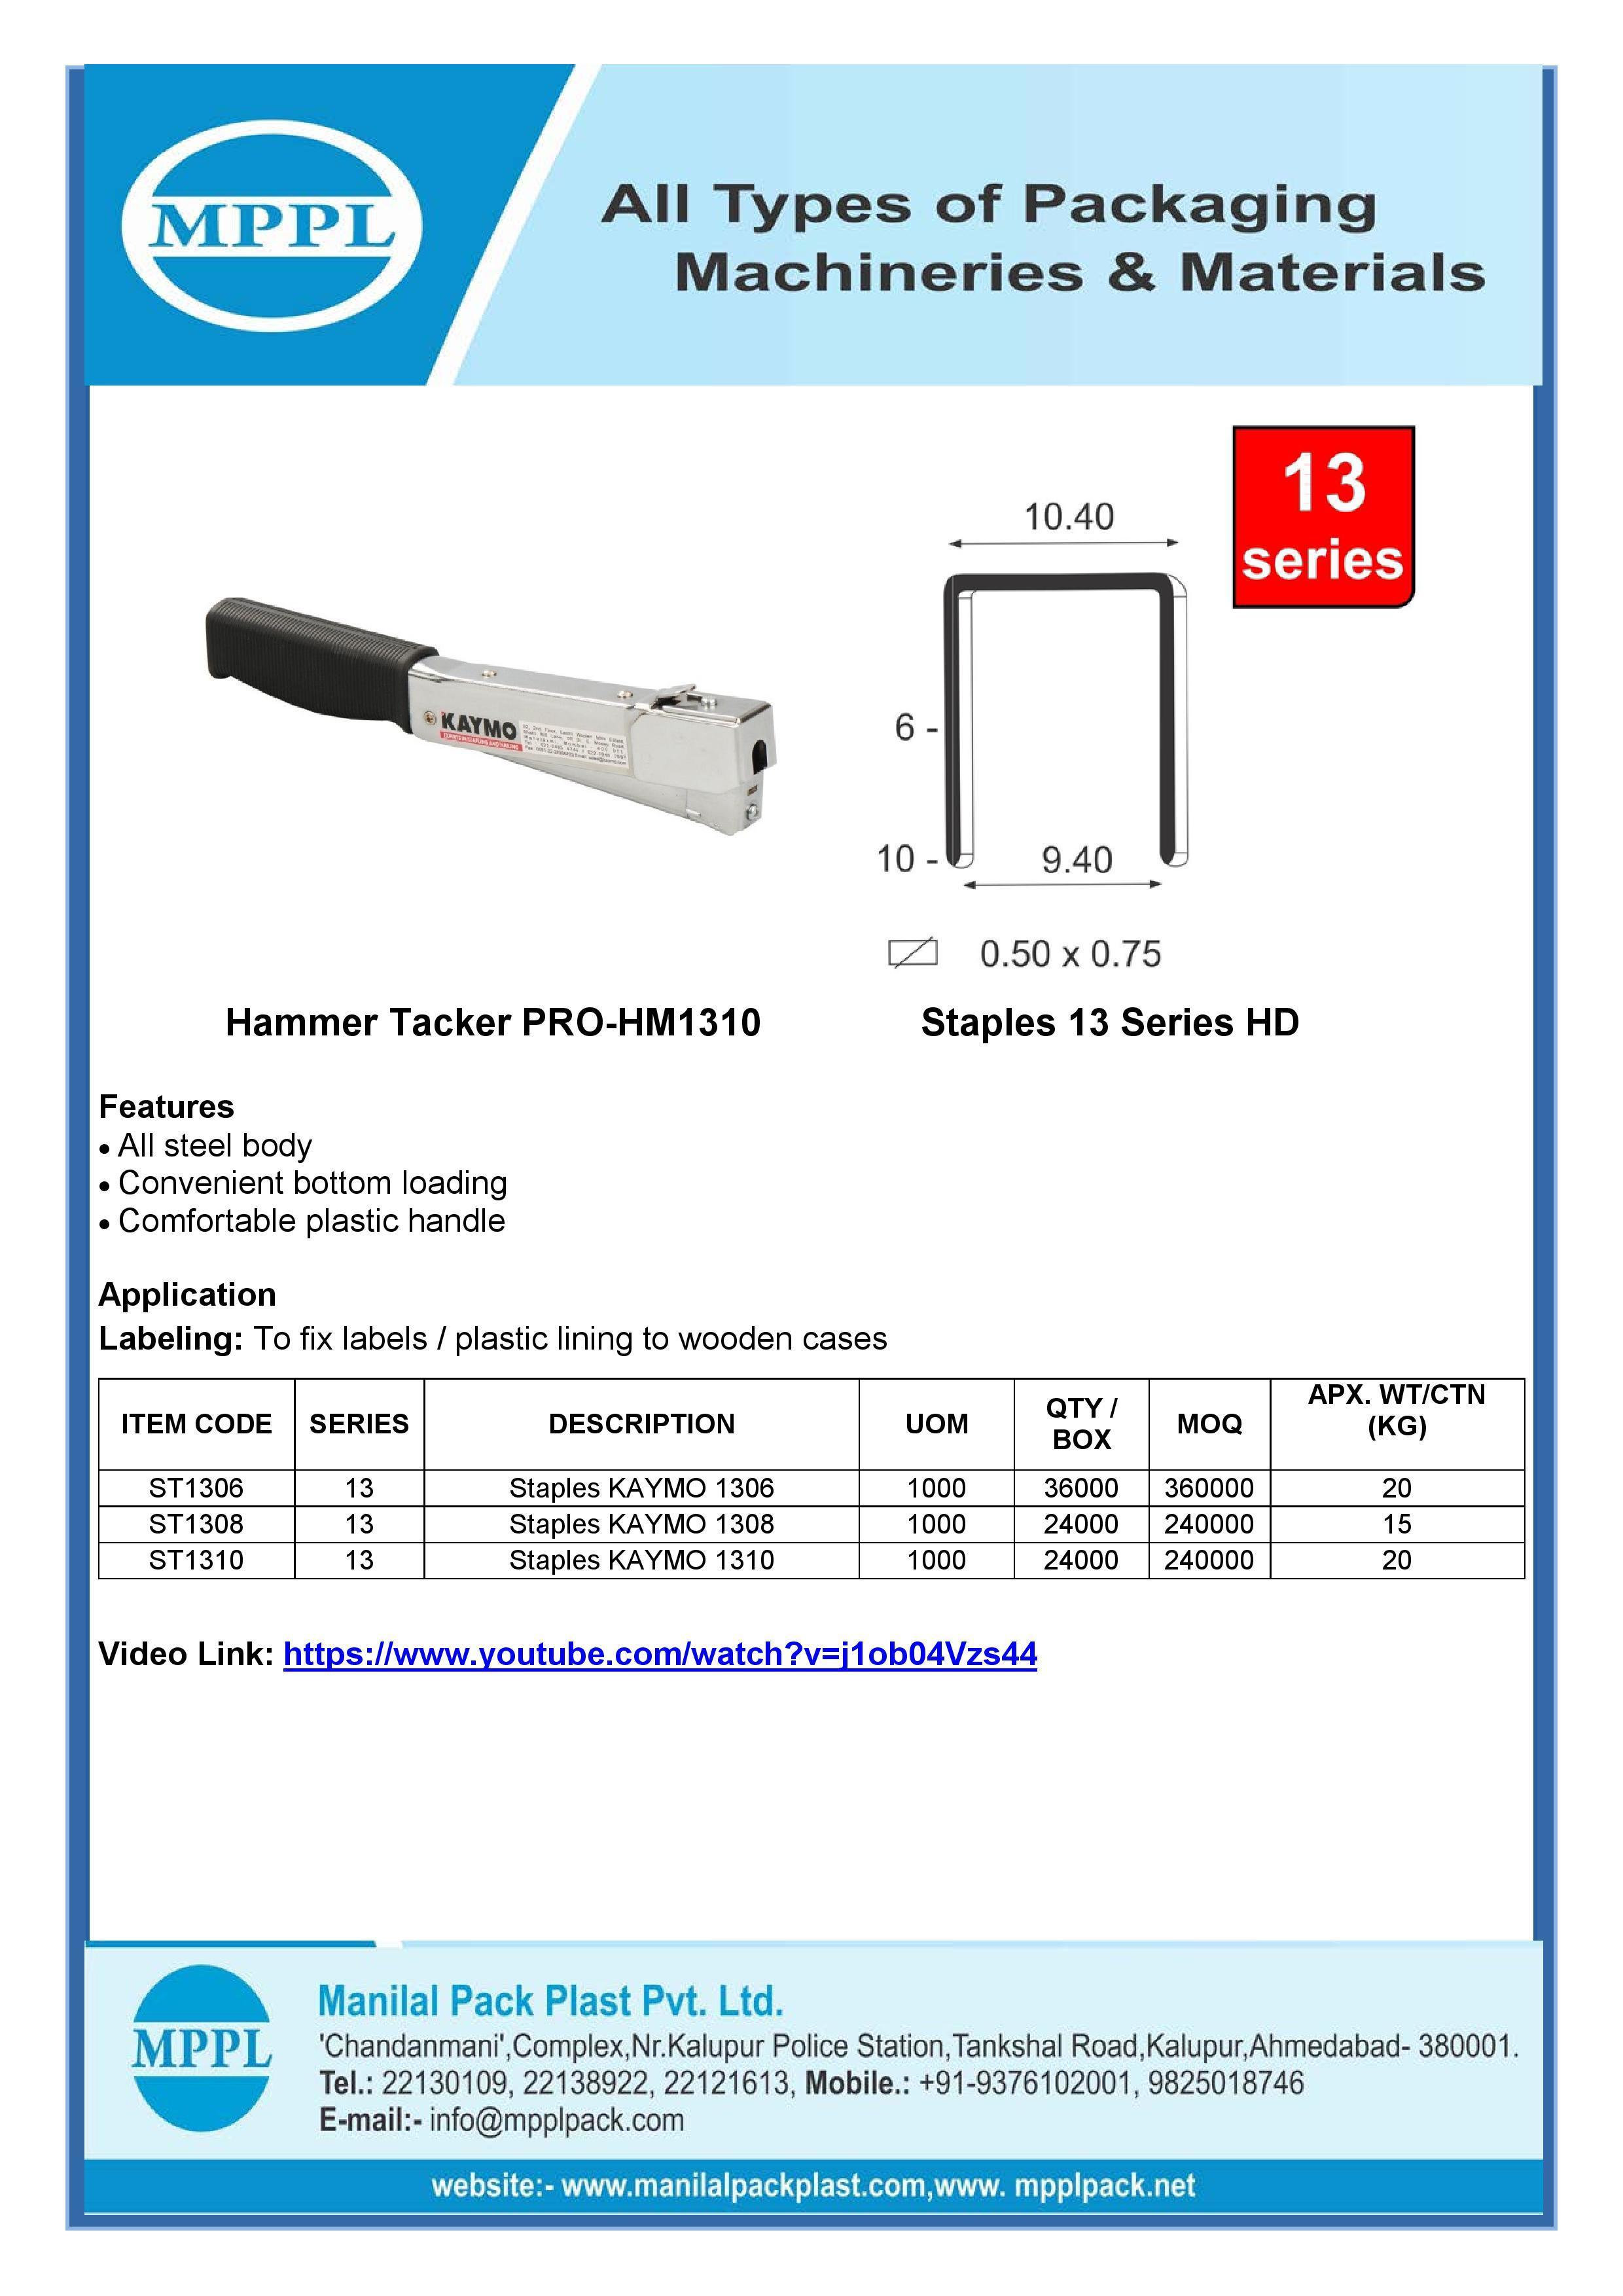 Hammer Tacker PRO-HM1310